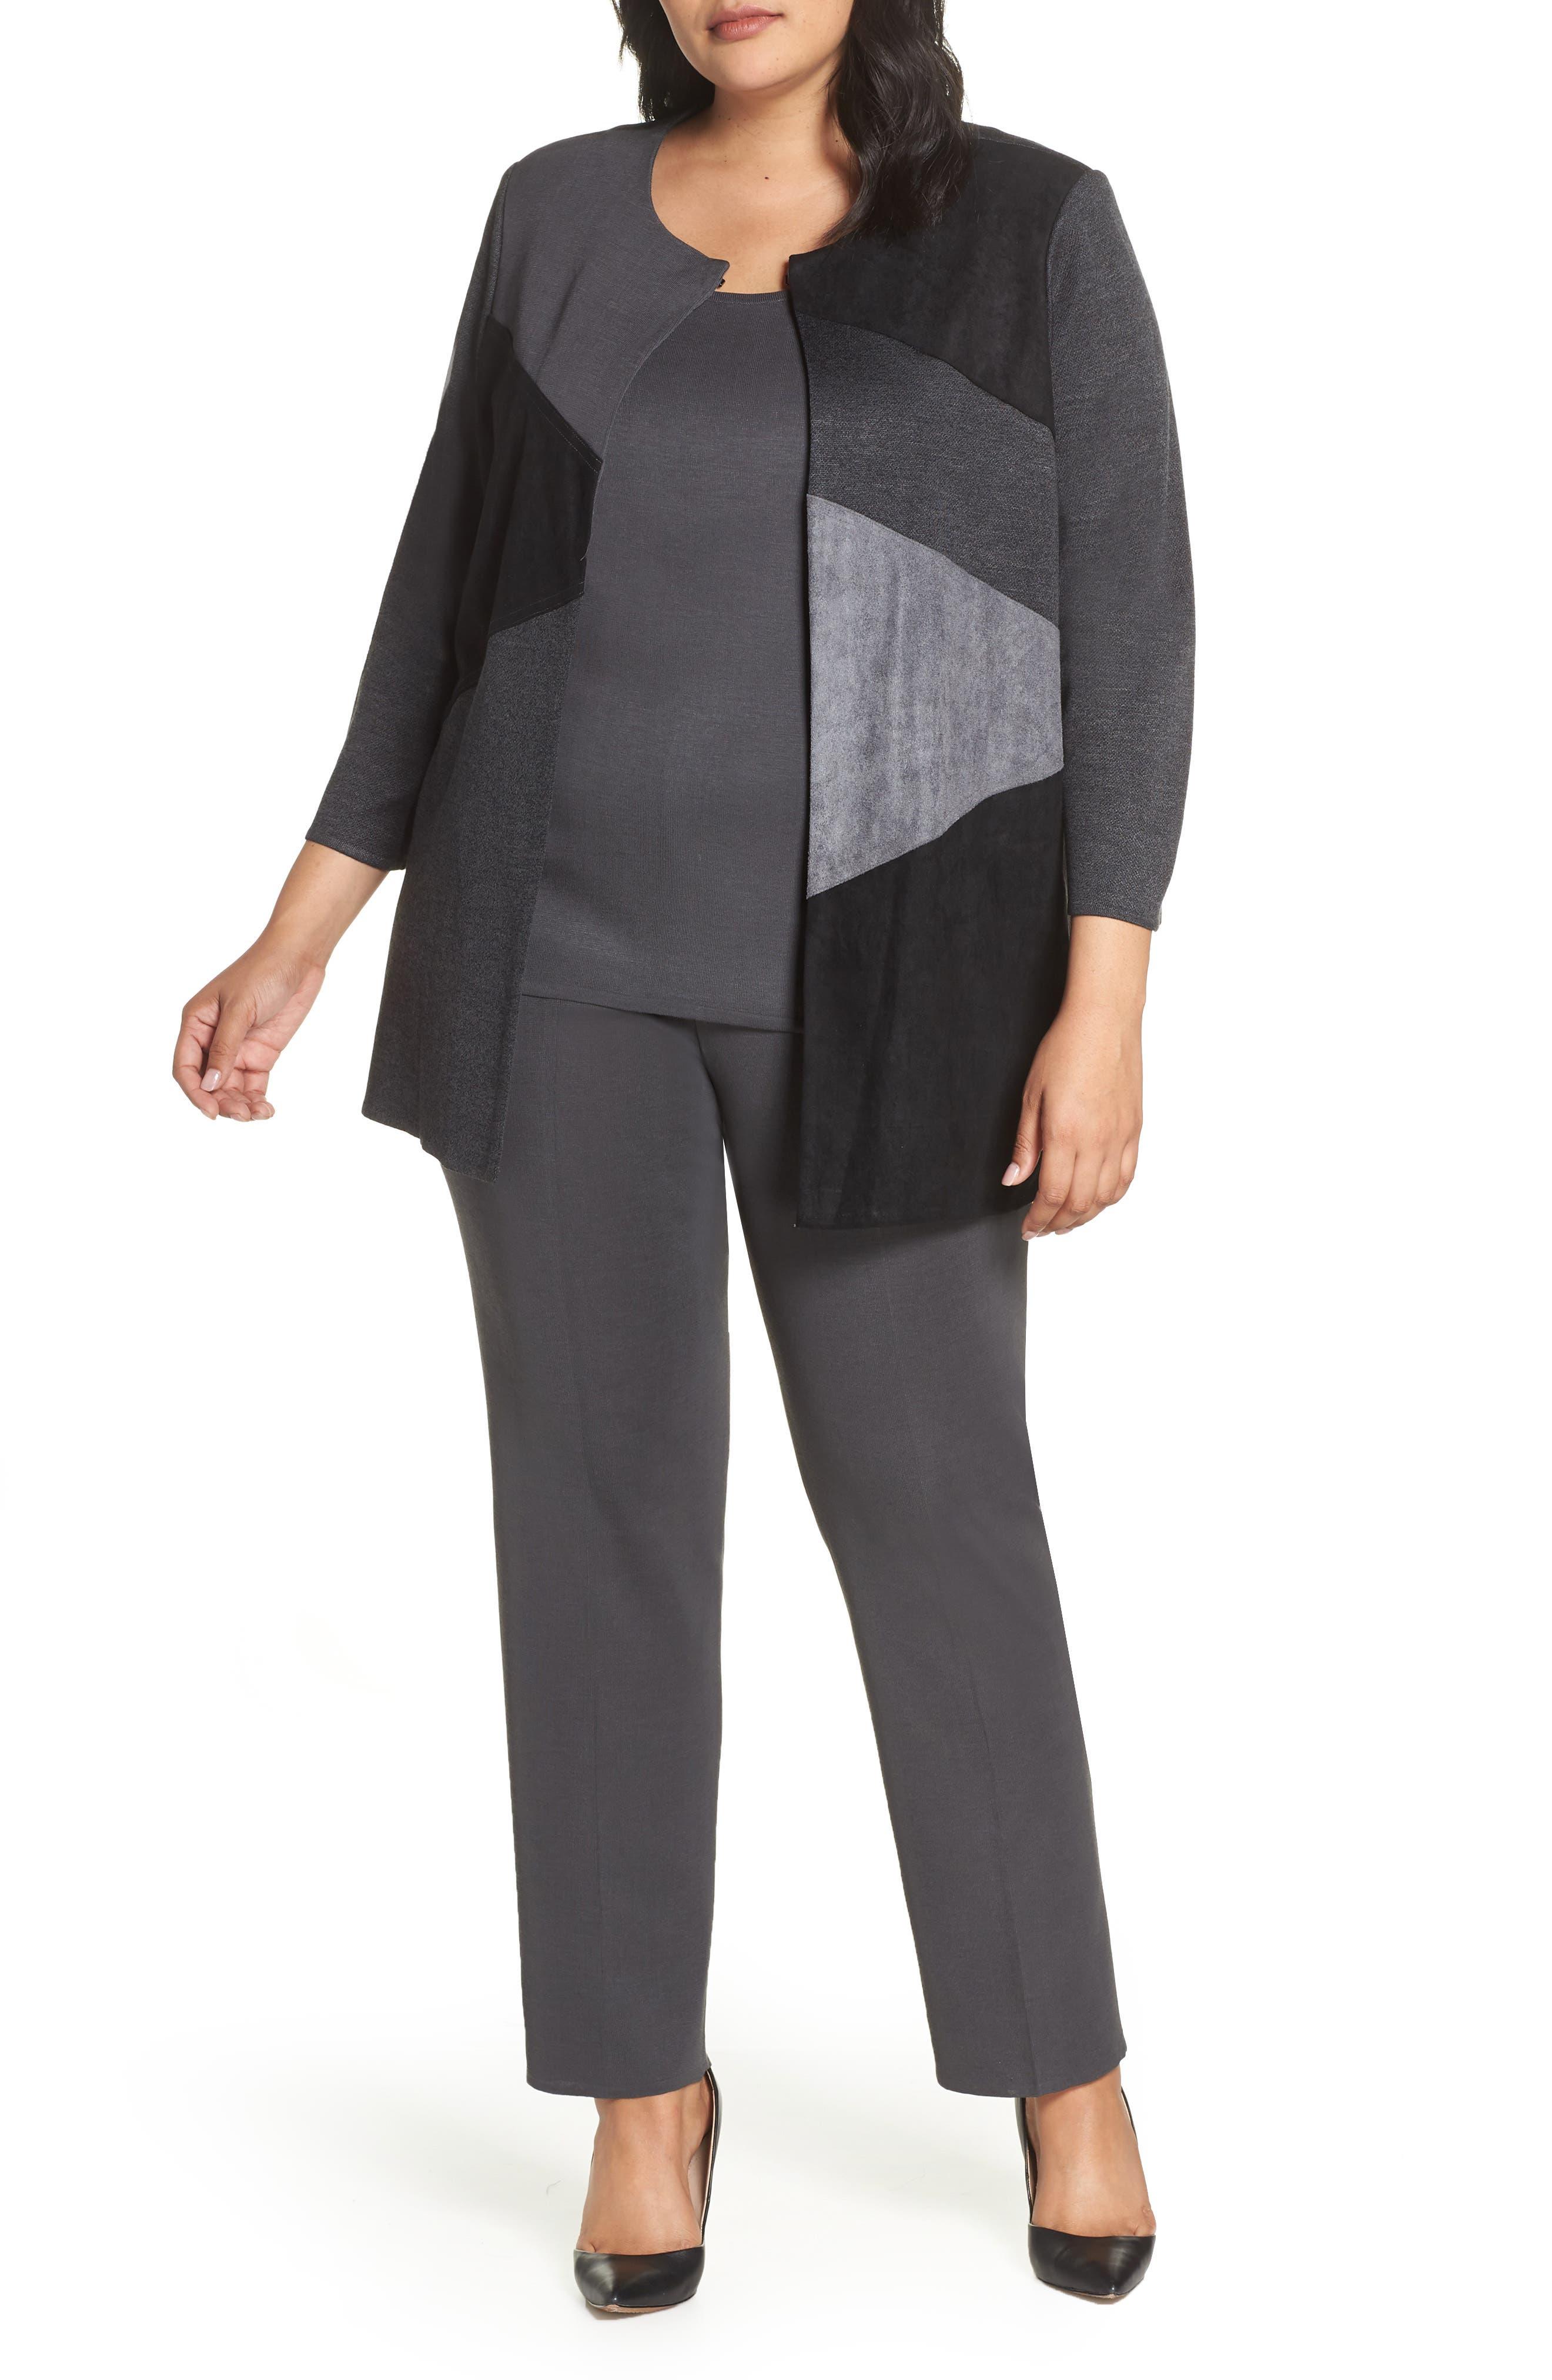 MING WANG Colorblock Knit Jacket, Main, color, BLACK/ GRANITE